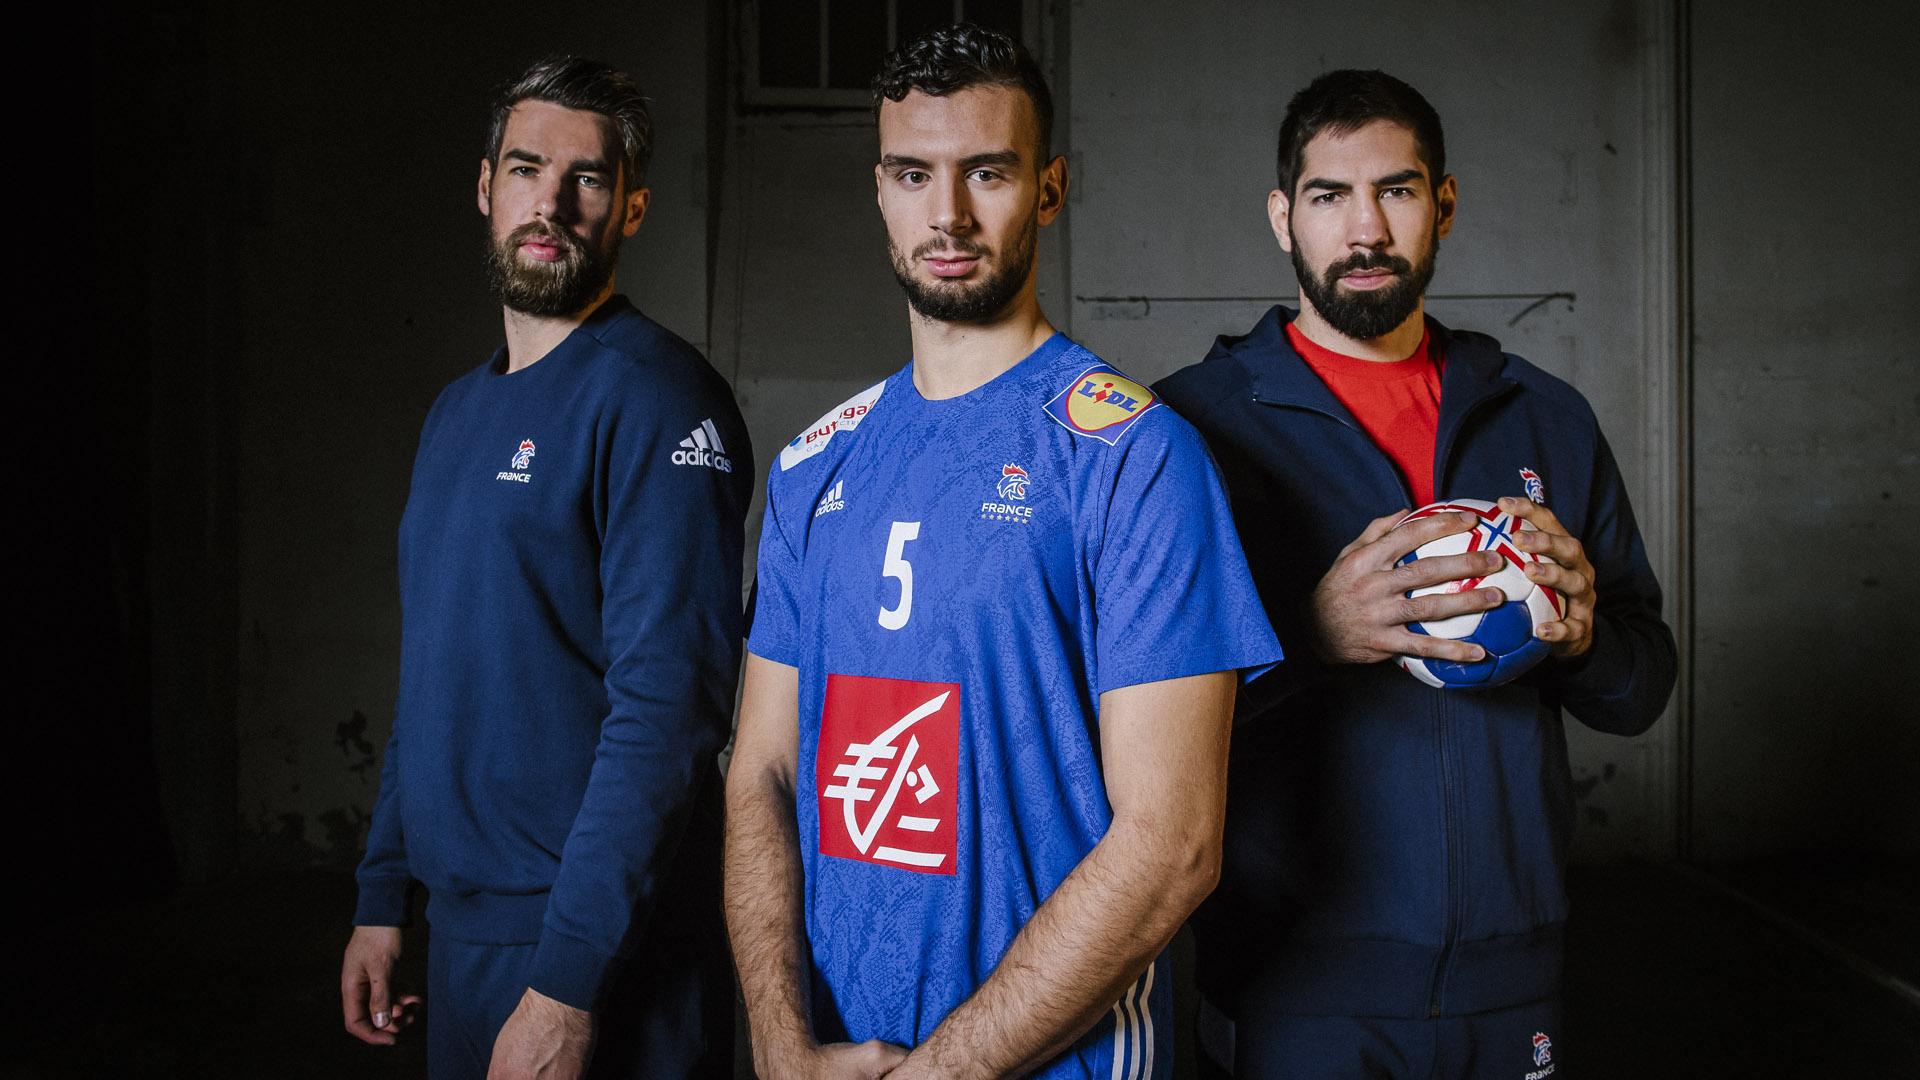 Luka Karabatic Nedim Remili Nikola Karabatic équipe de france de handball adidas nouveau maillot